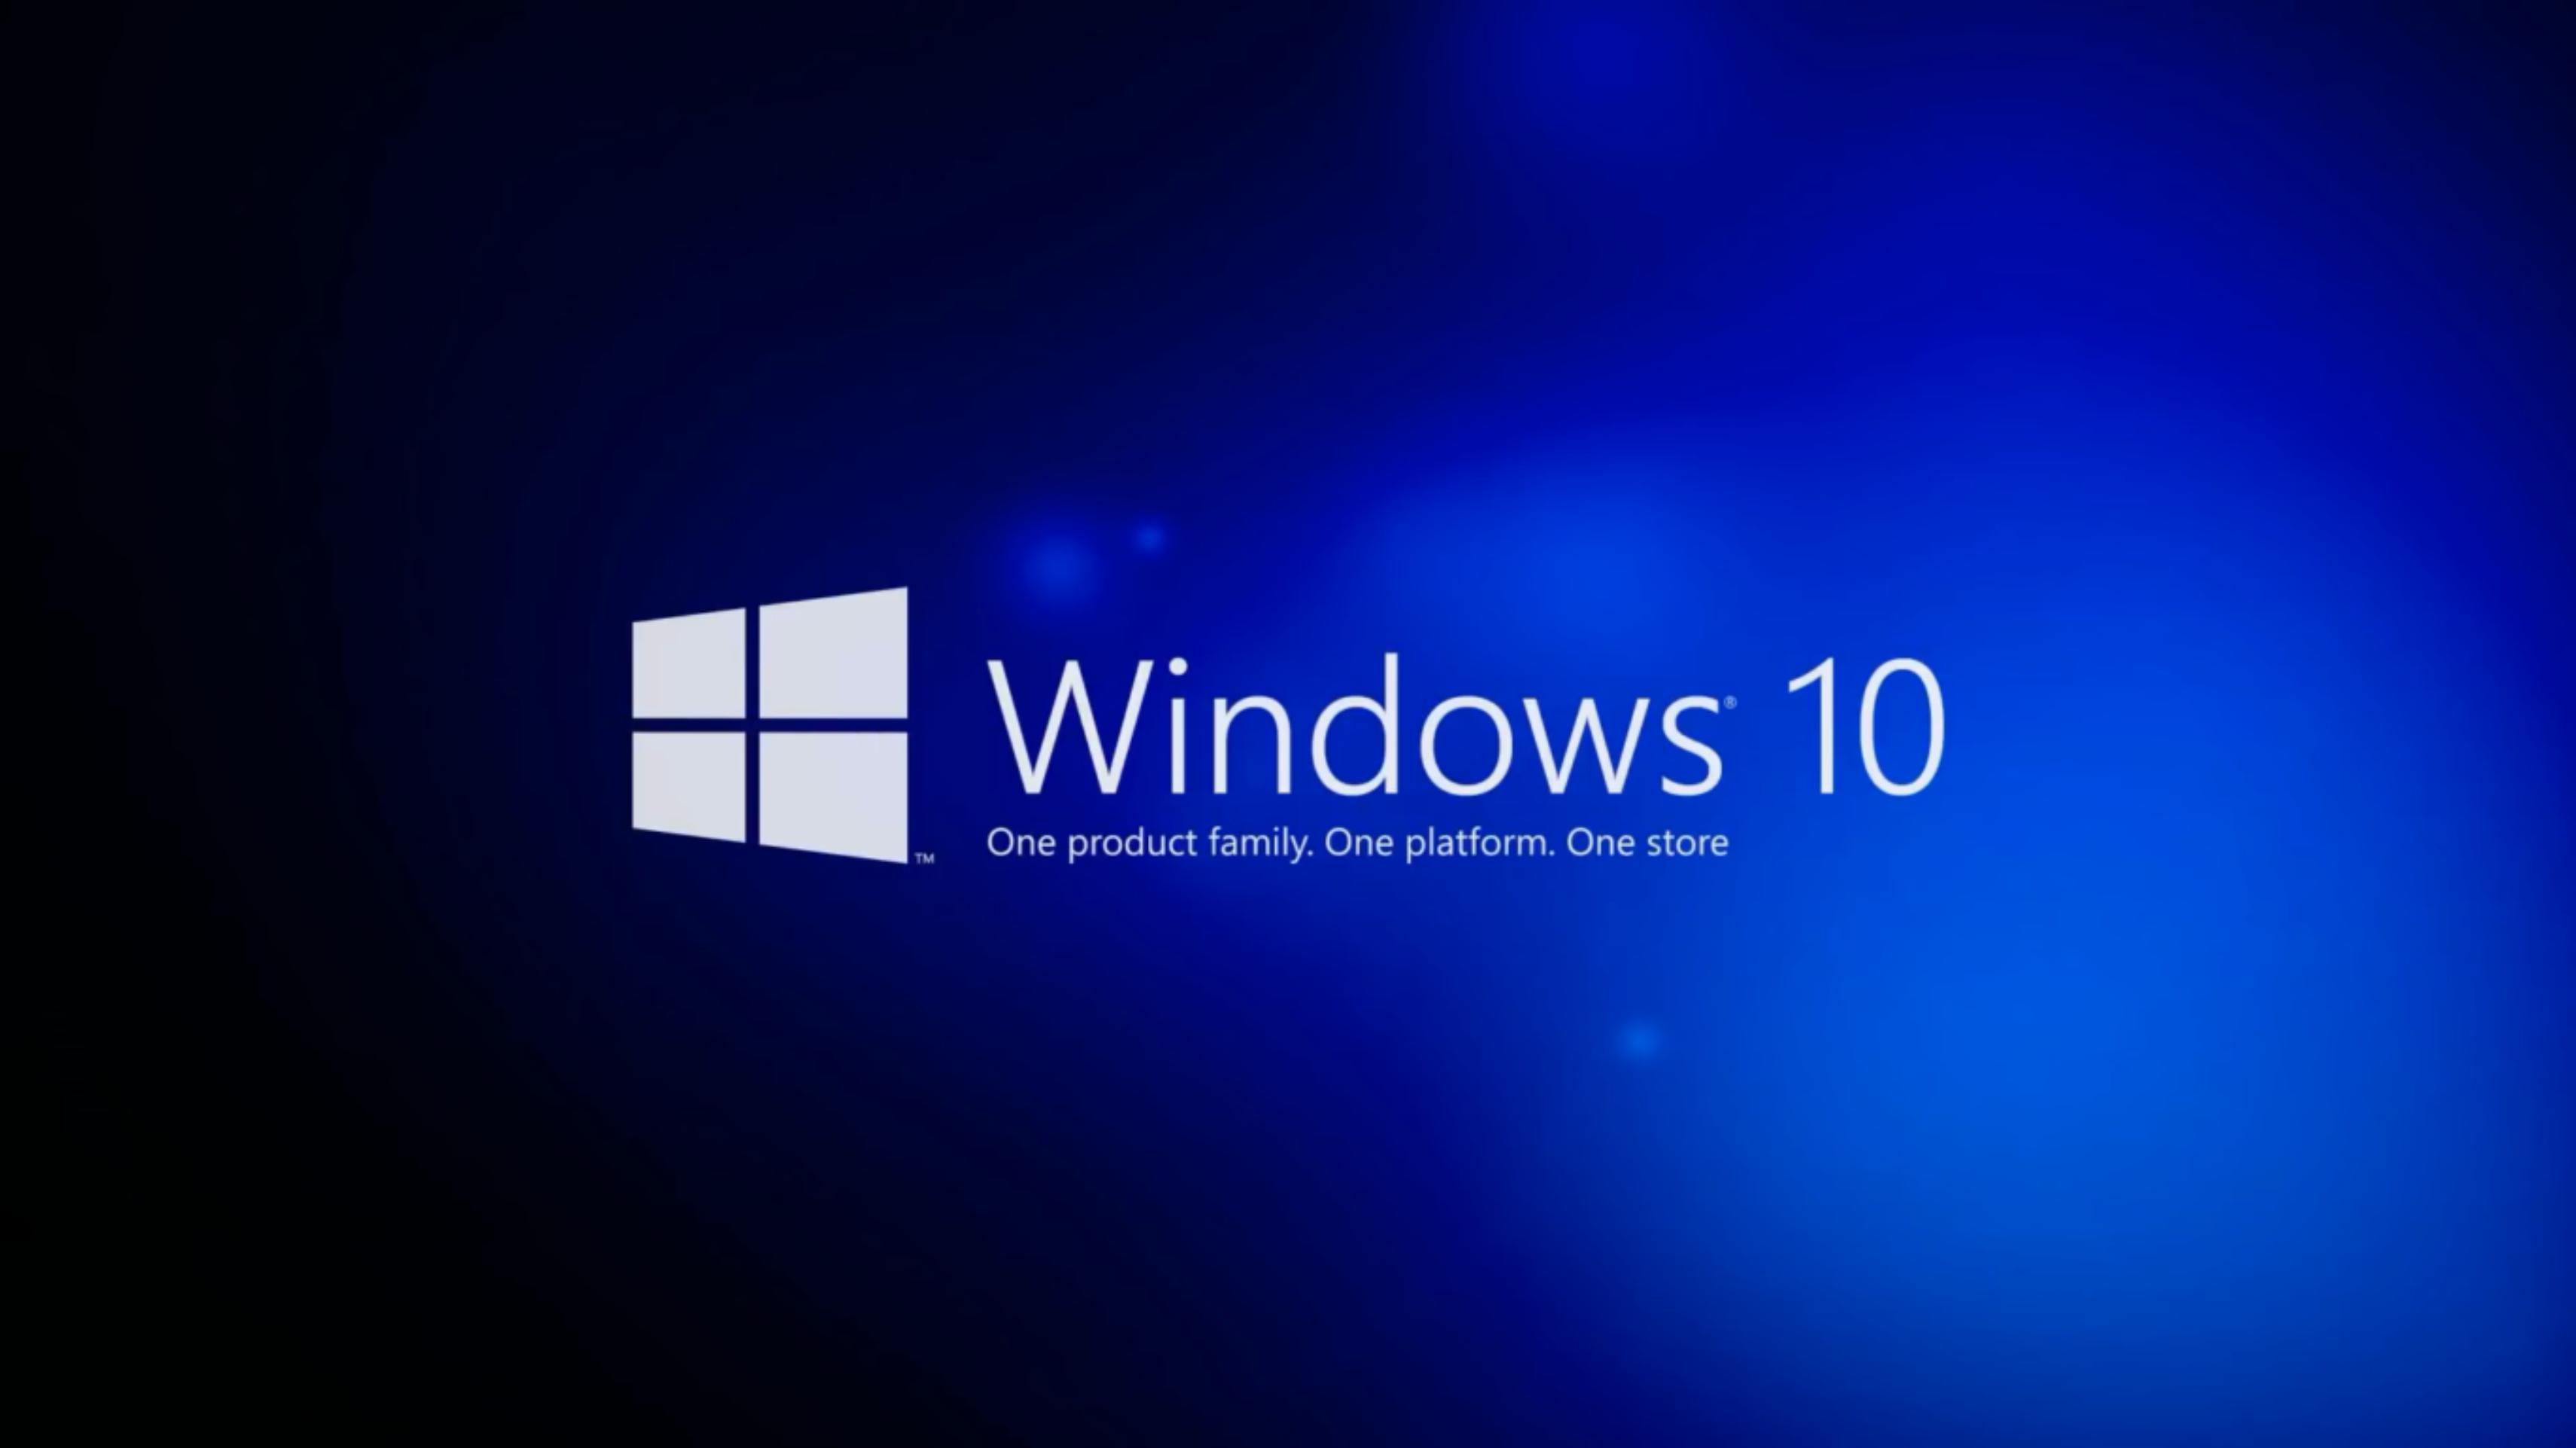 Cara Install Ulang Windows 10 Dengan Flashdsik Dvd